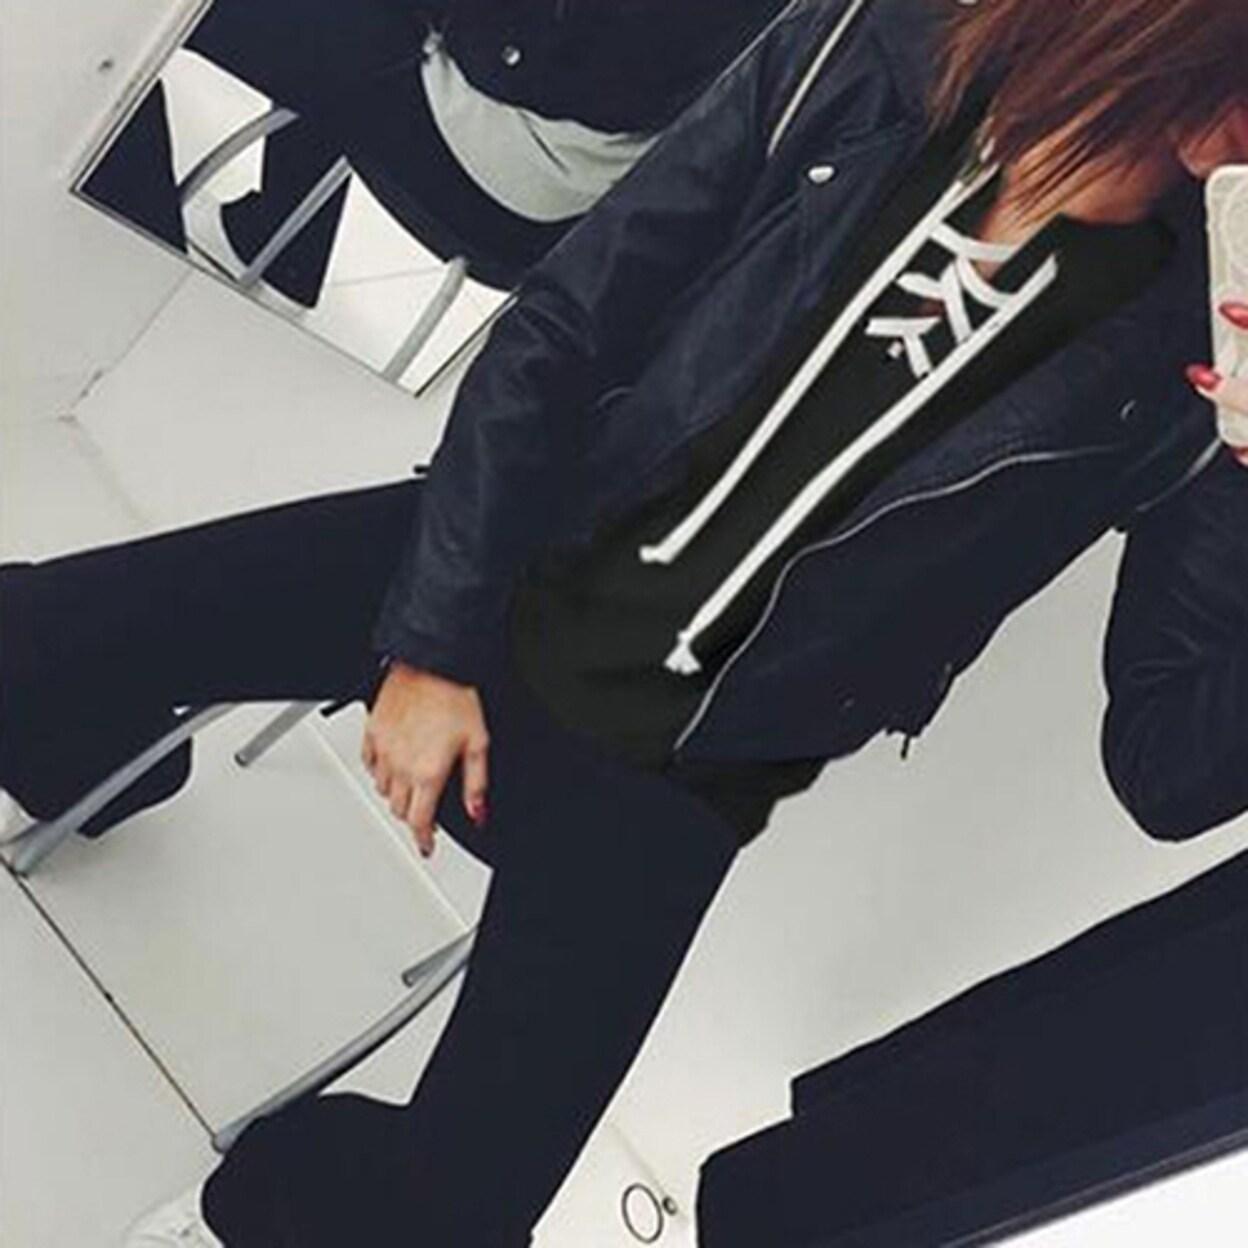 Women Fashion Solid Color Top Full Length Long Sleeve Hoodie Casual Sweatshirt